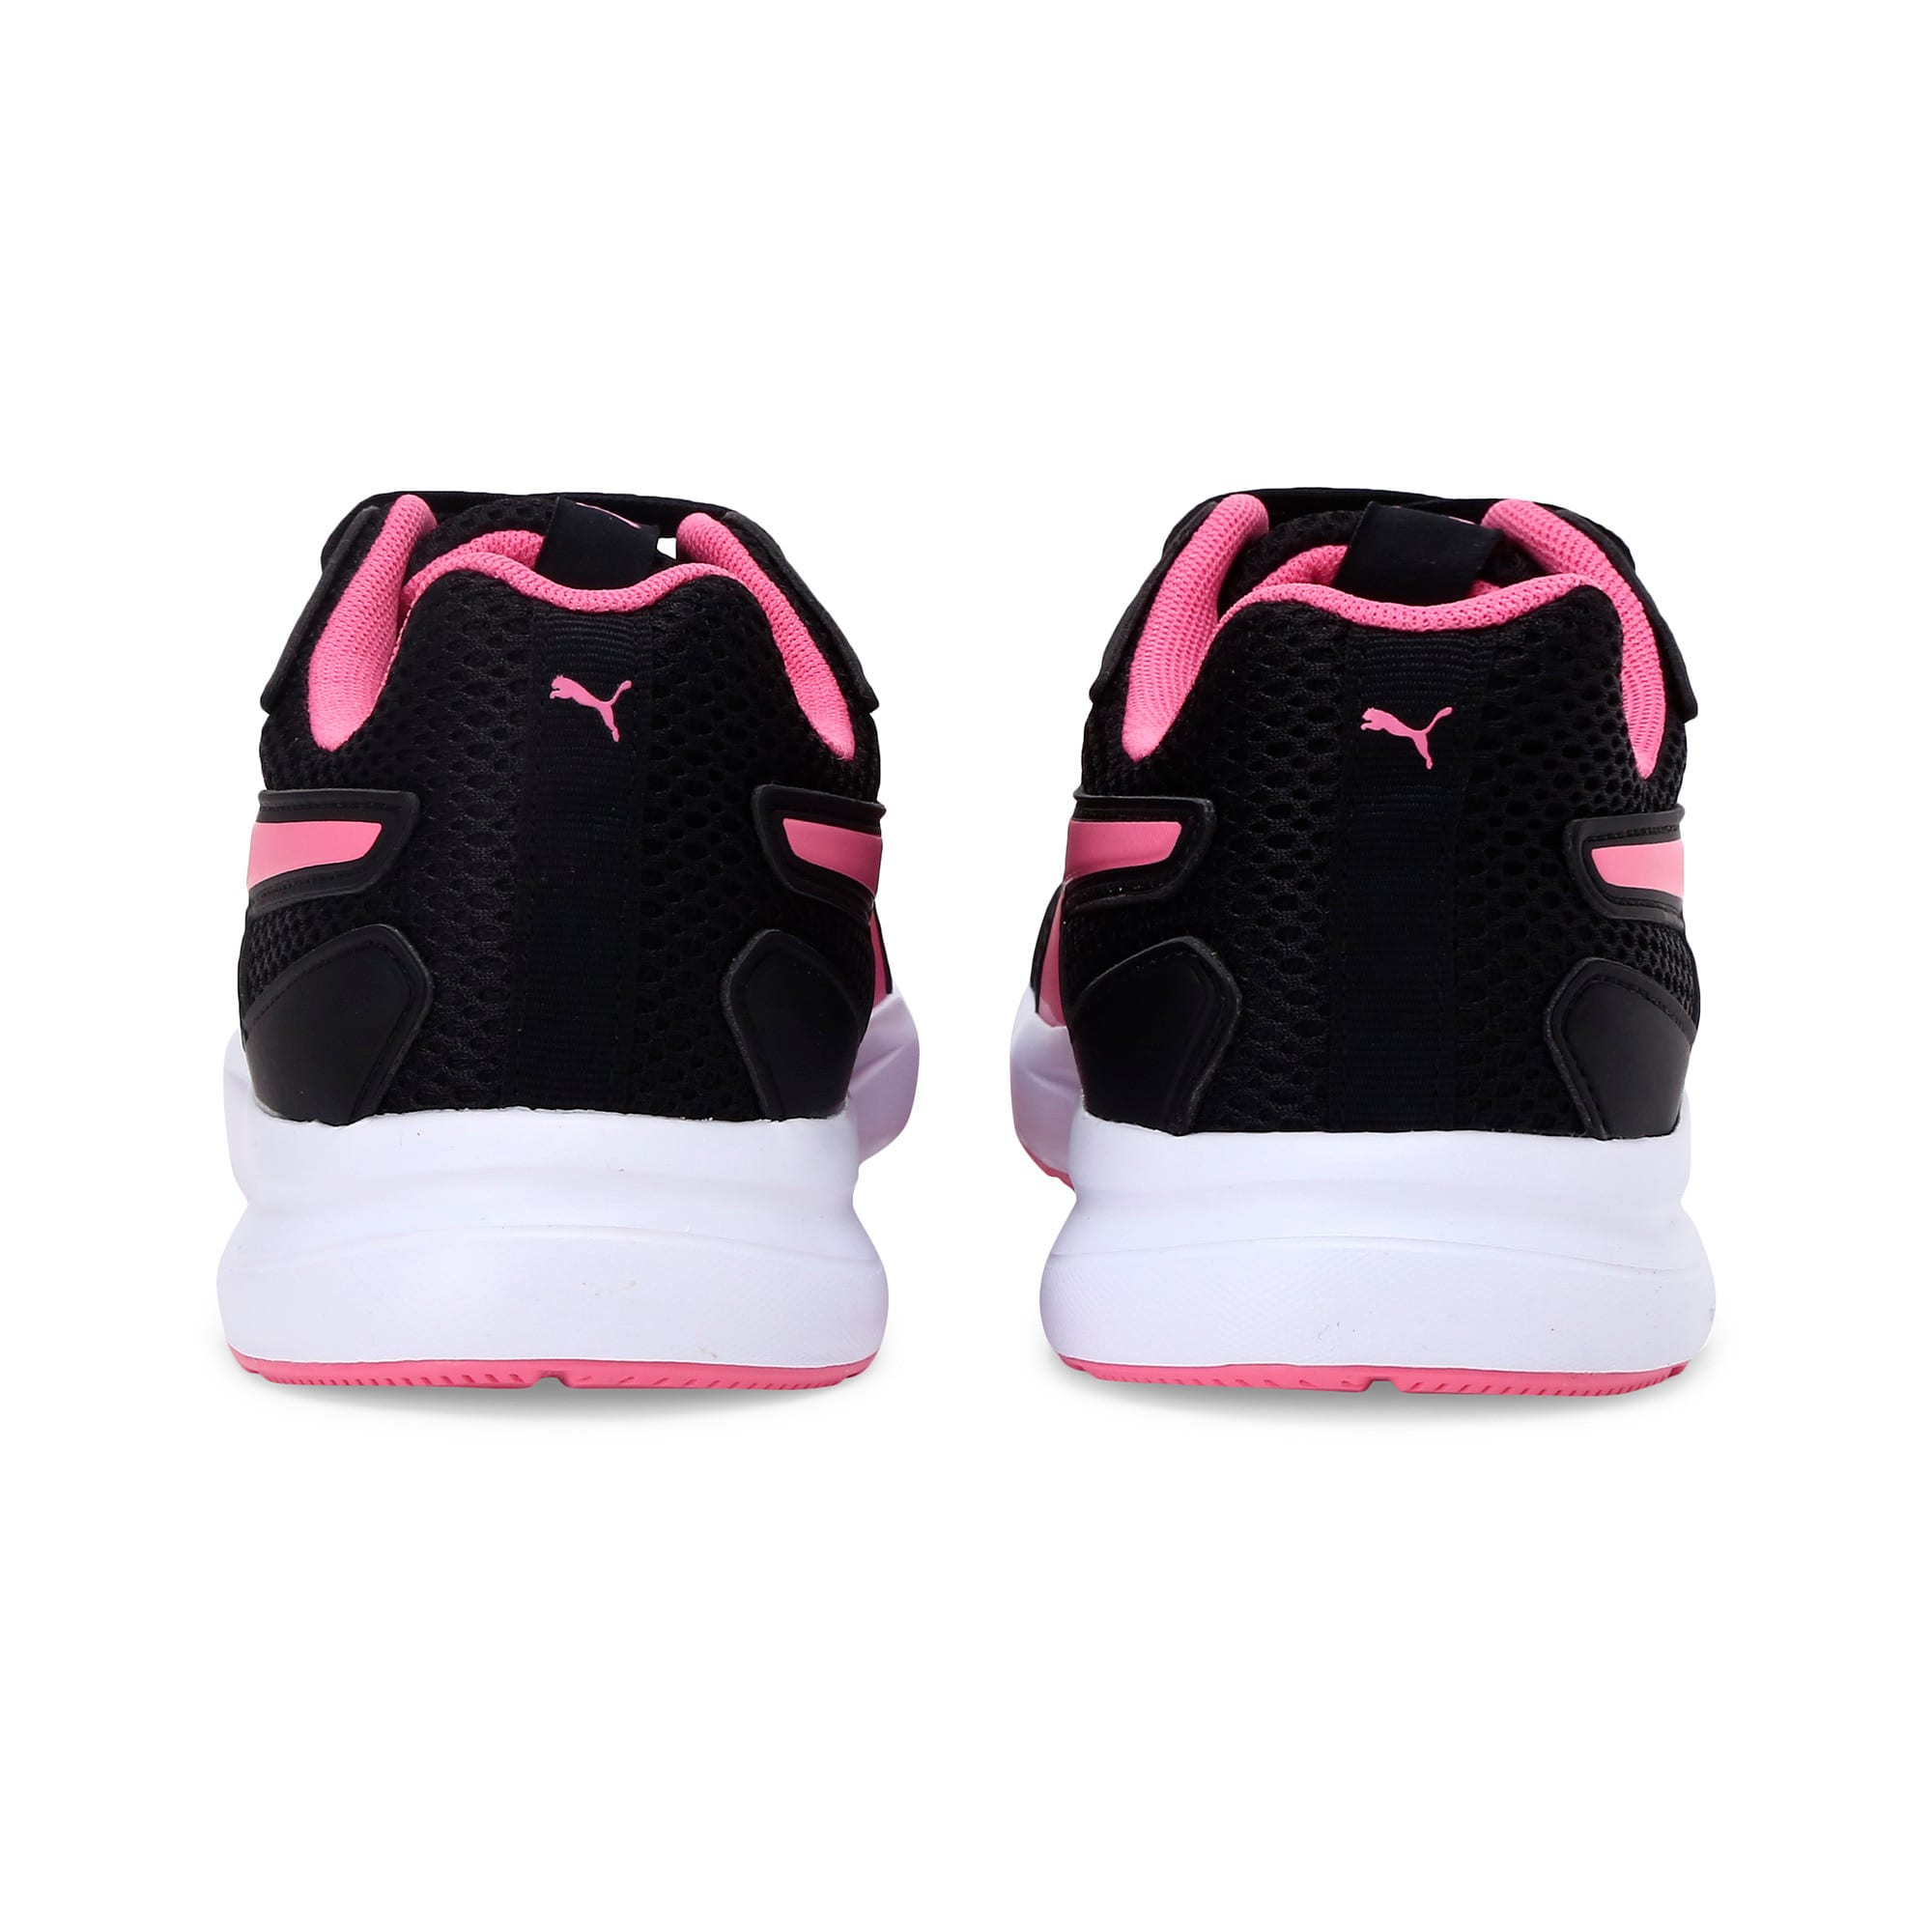 Thumbnail 5 of Escaper Training Shoes, Puma Black-Azalea Pink-White, medium-IND